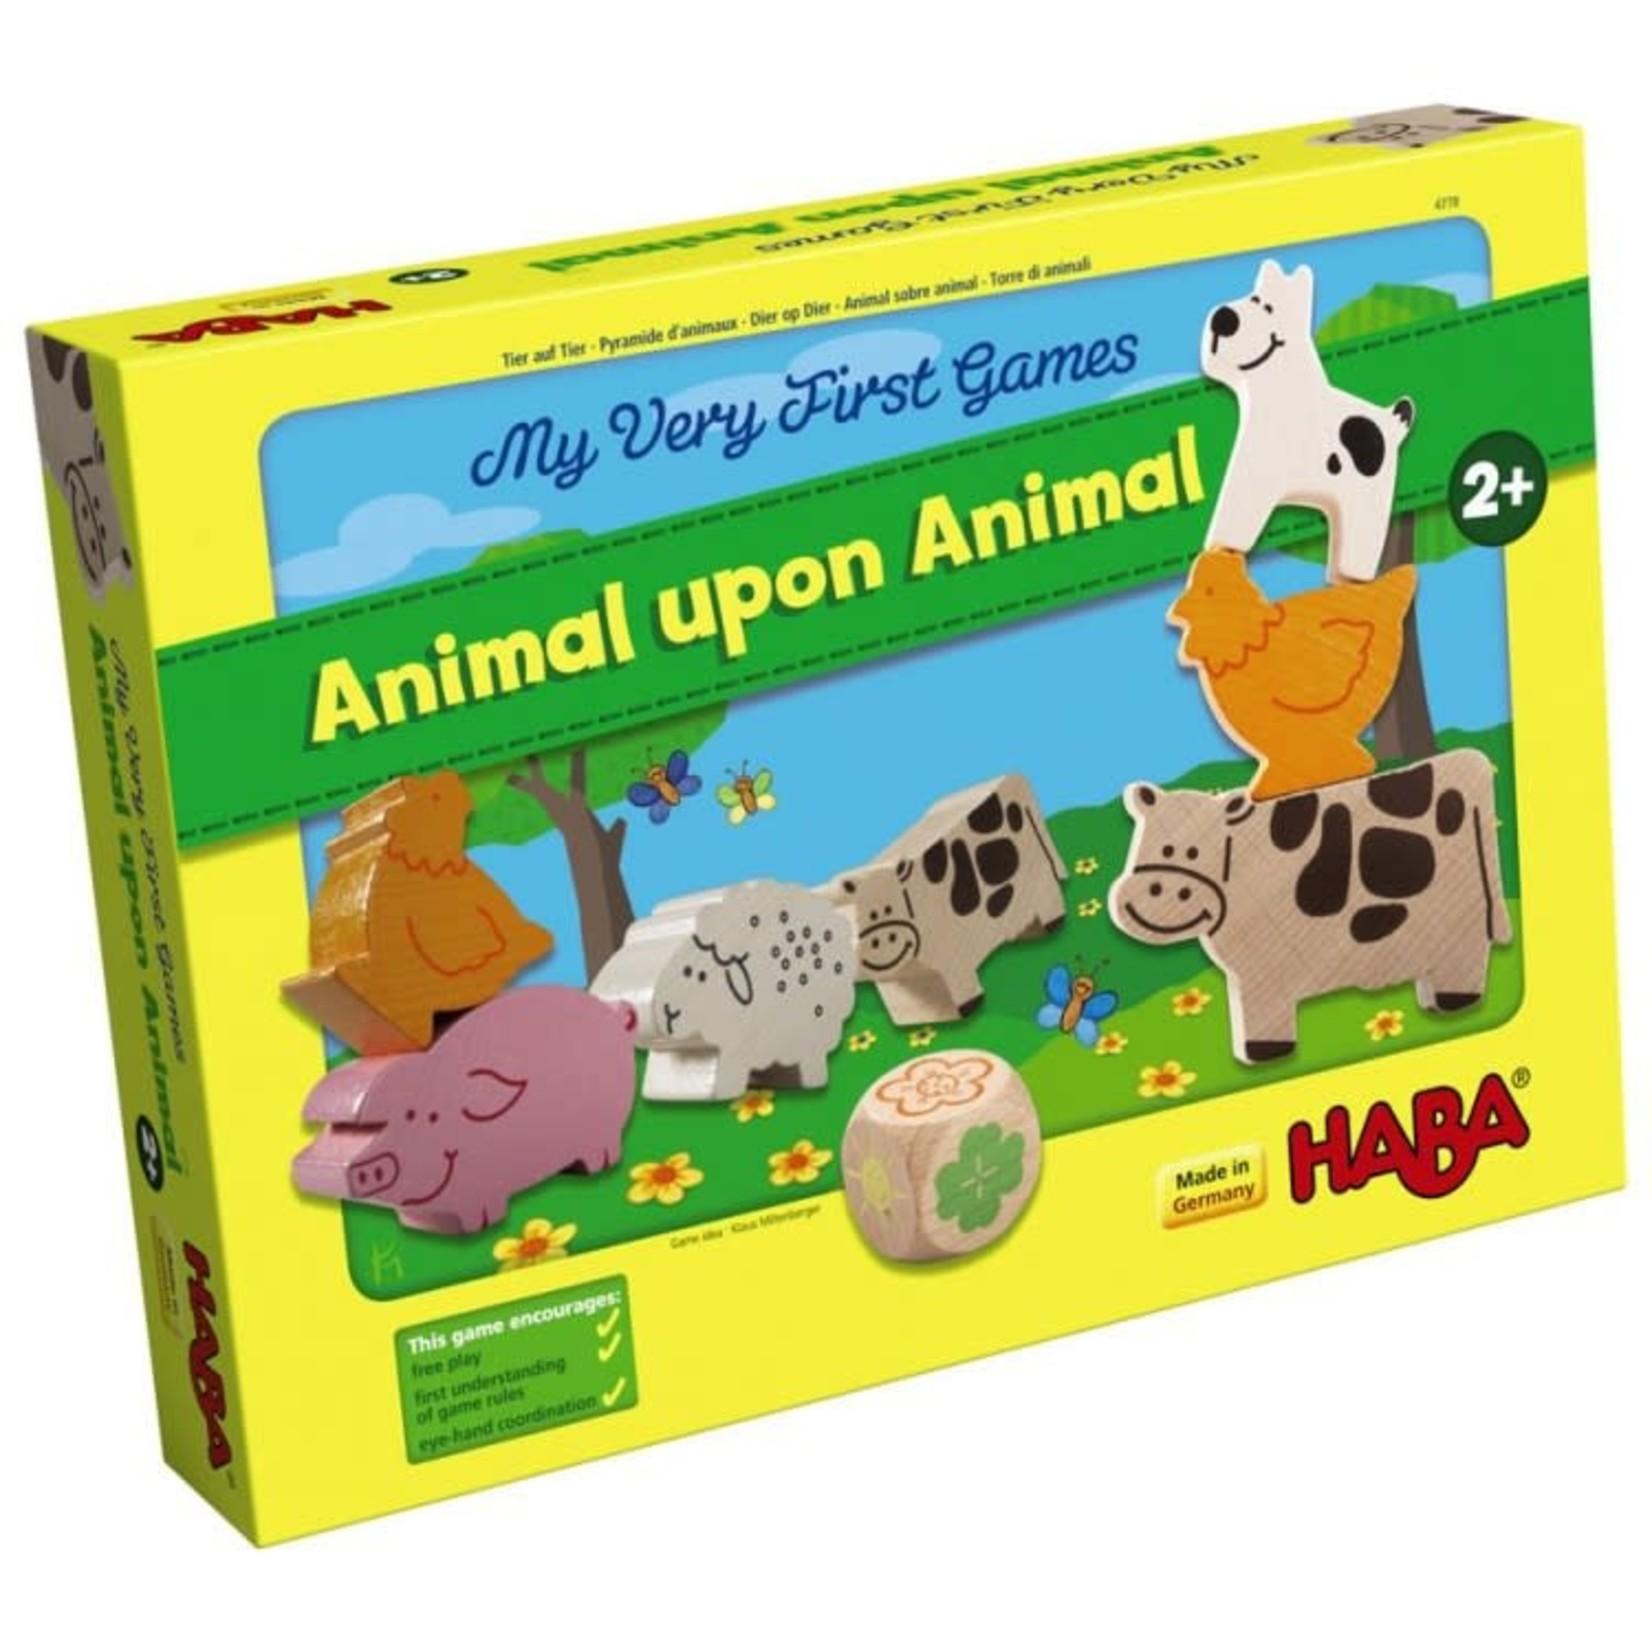 Haba My Very First Game: Animal upon Animal